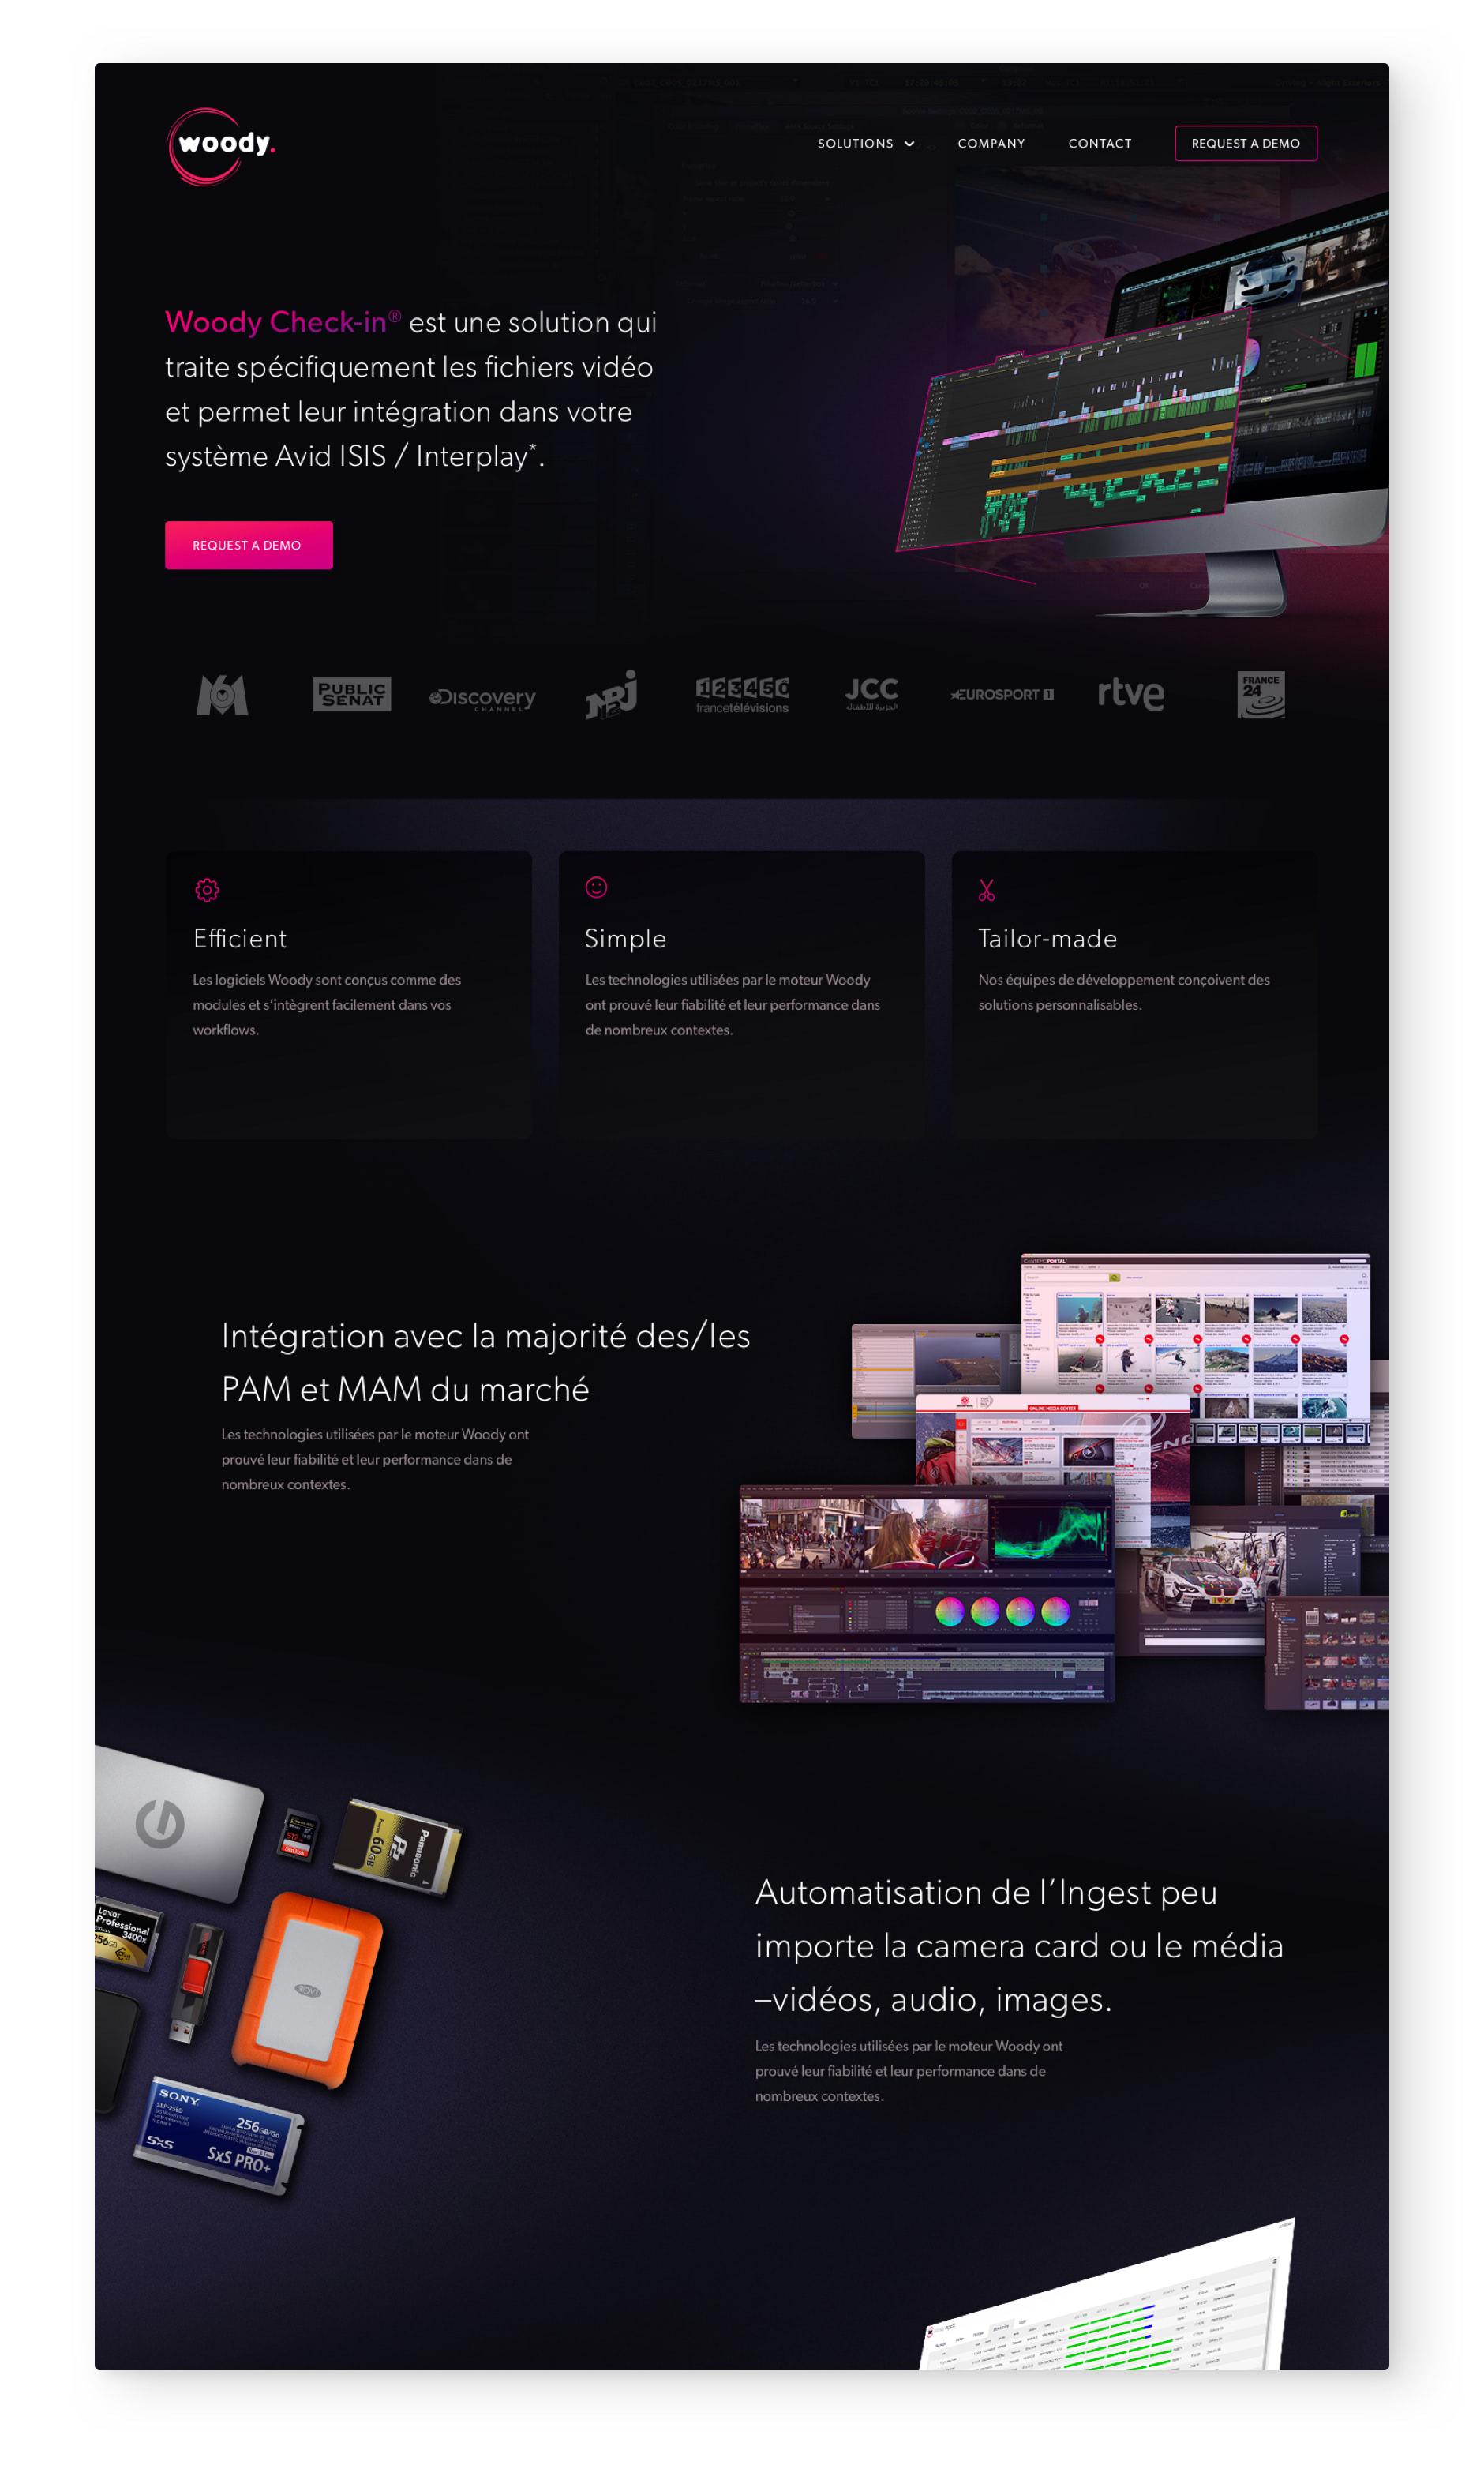 projet-woody-website-robin_p-designer_03@2x